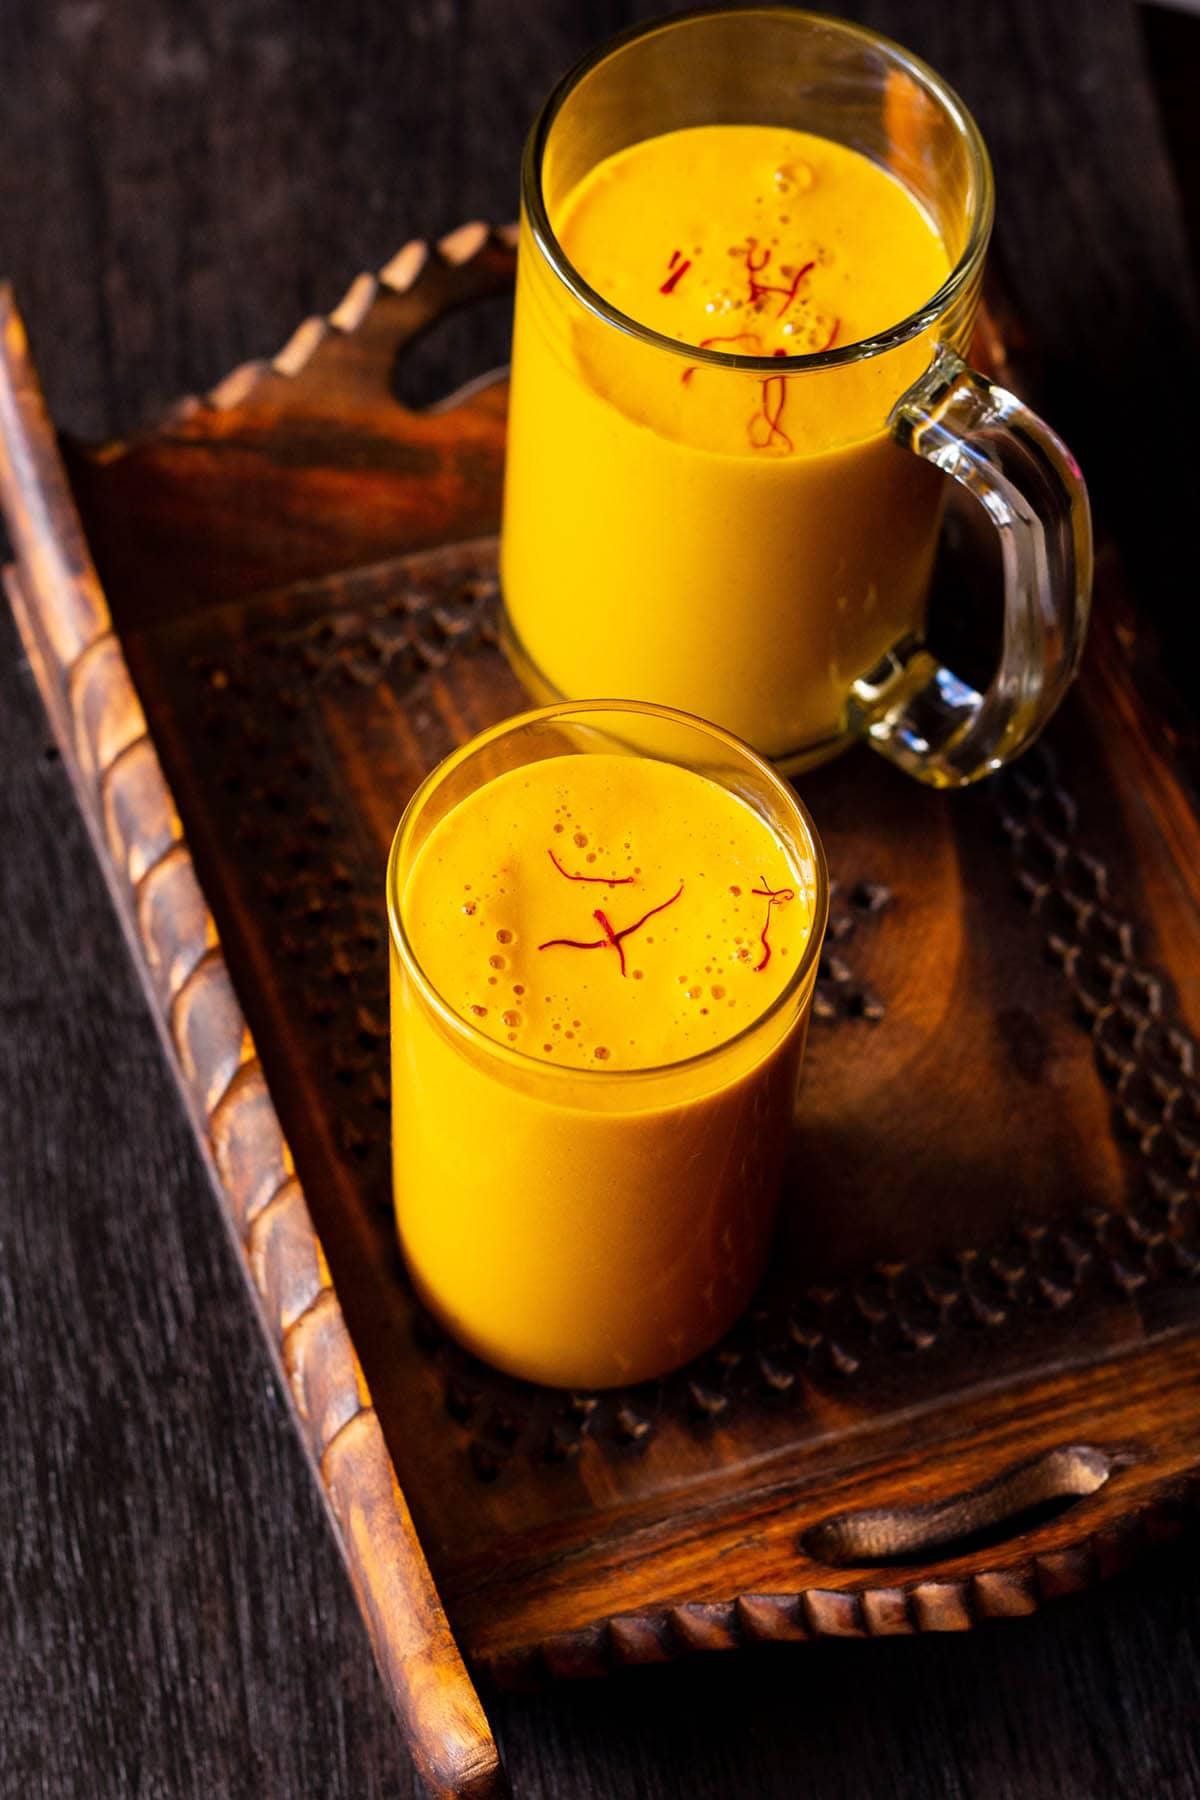 vegan mango milkshake in glass and a mug sprinkled with few saffron strands on a dark brown wooden tray